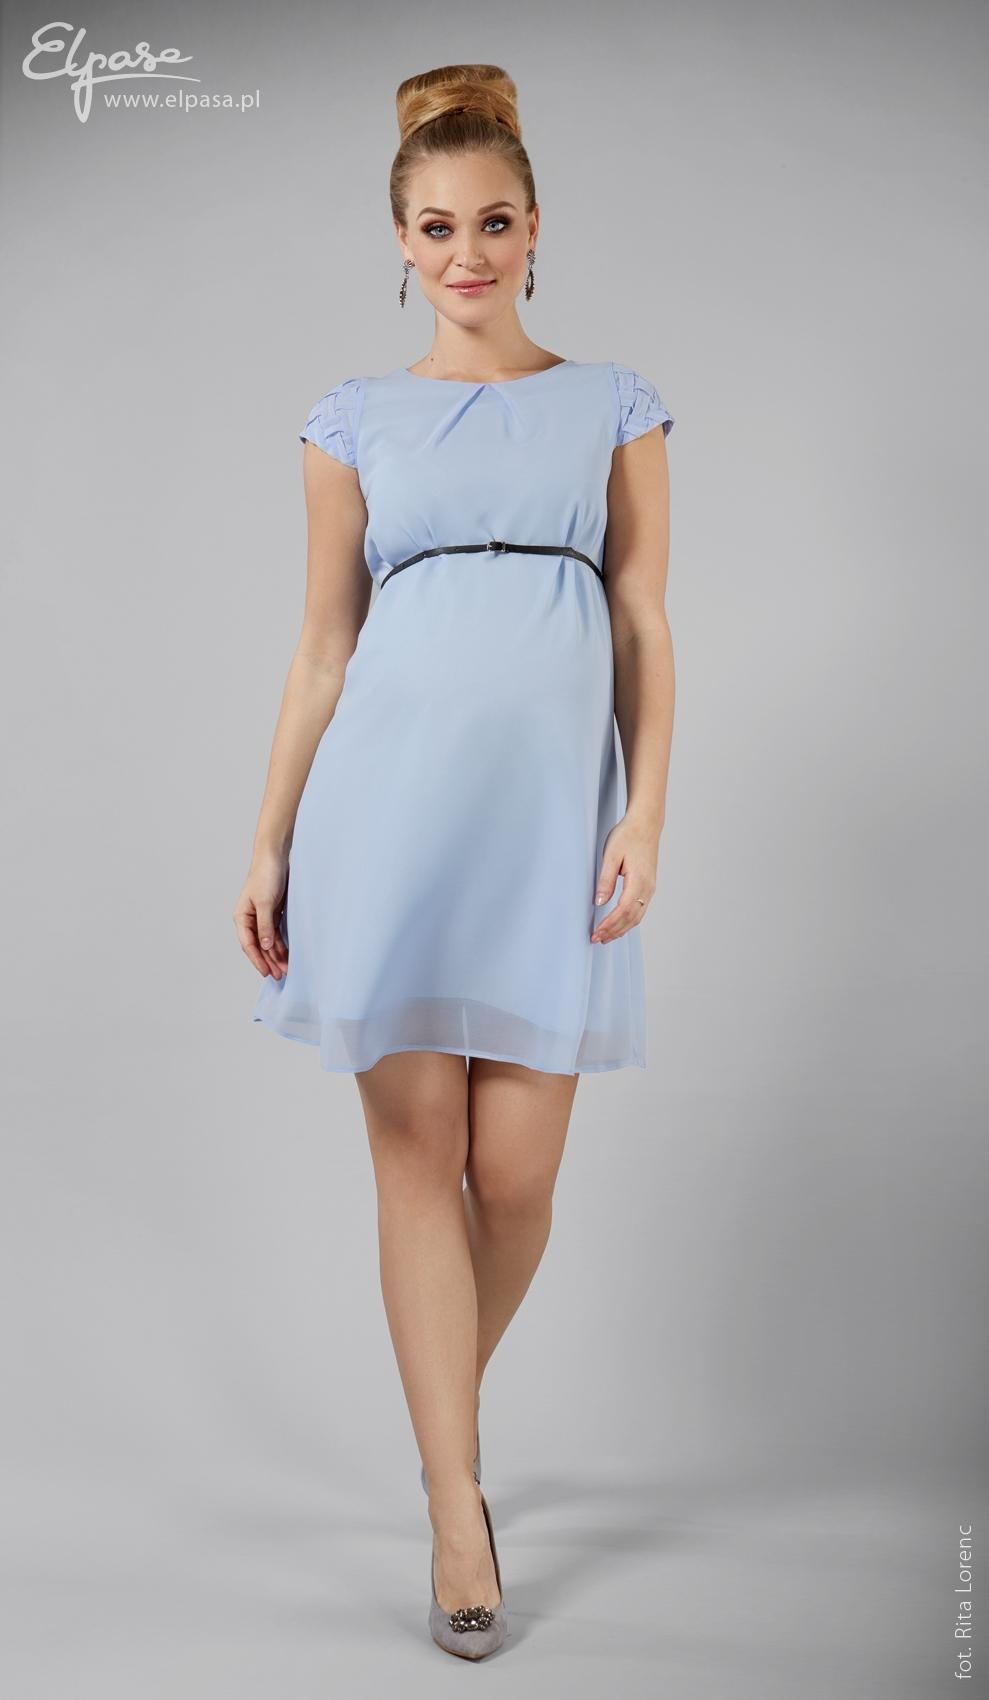 905c0e1f4 Tehotenské šaty Hanah - ELPASA | MamaStyl.sk - tehotenská móda ...